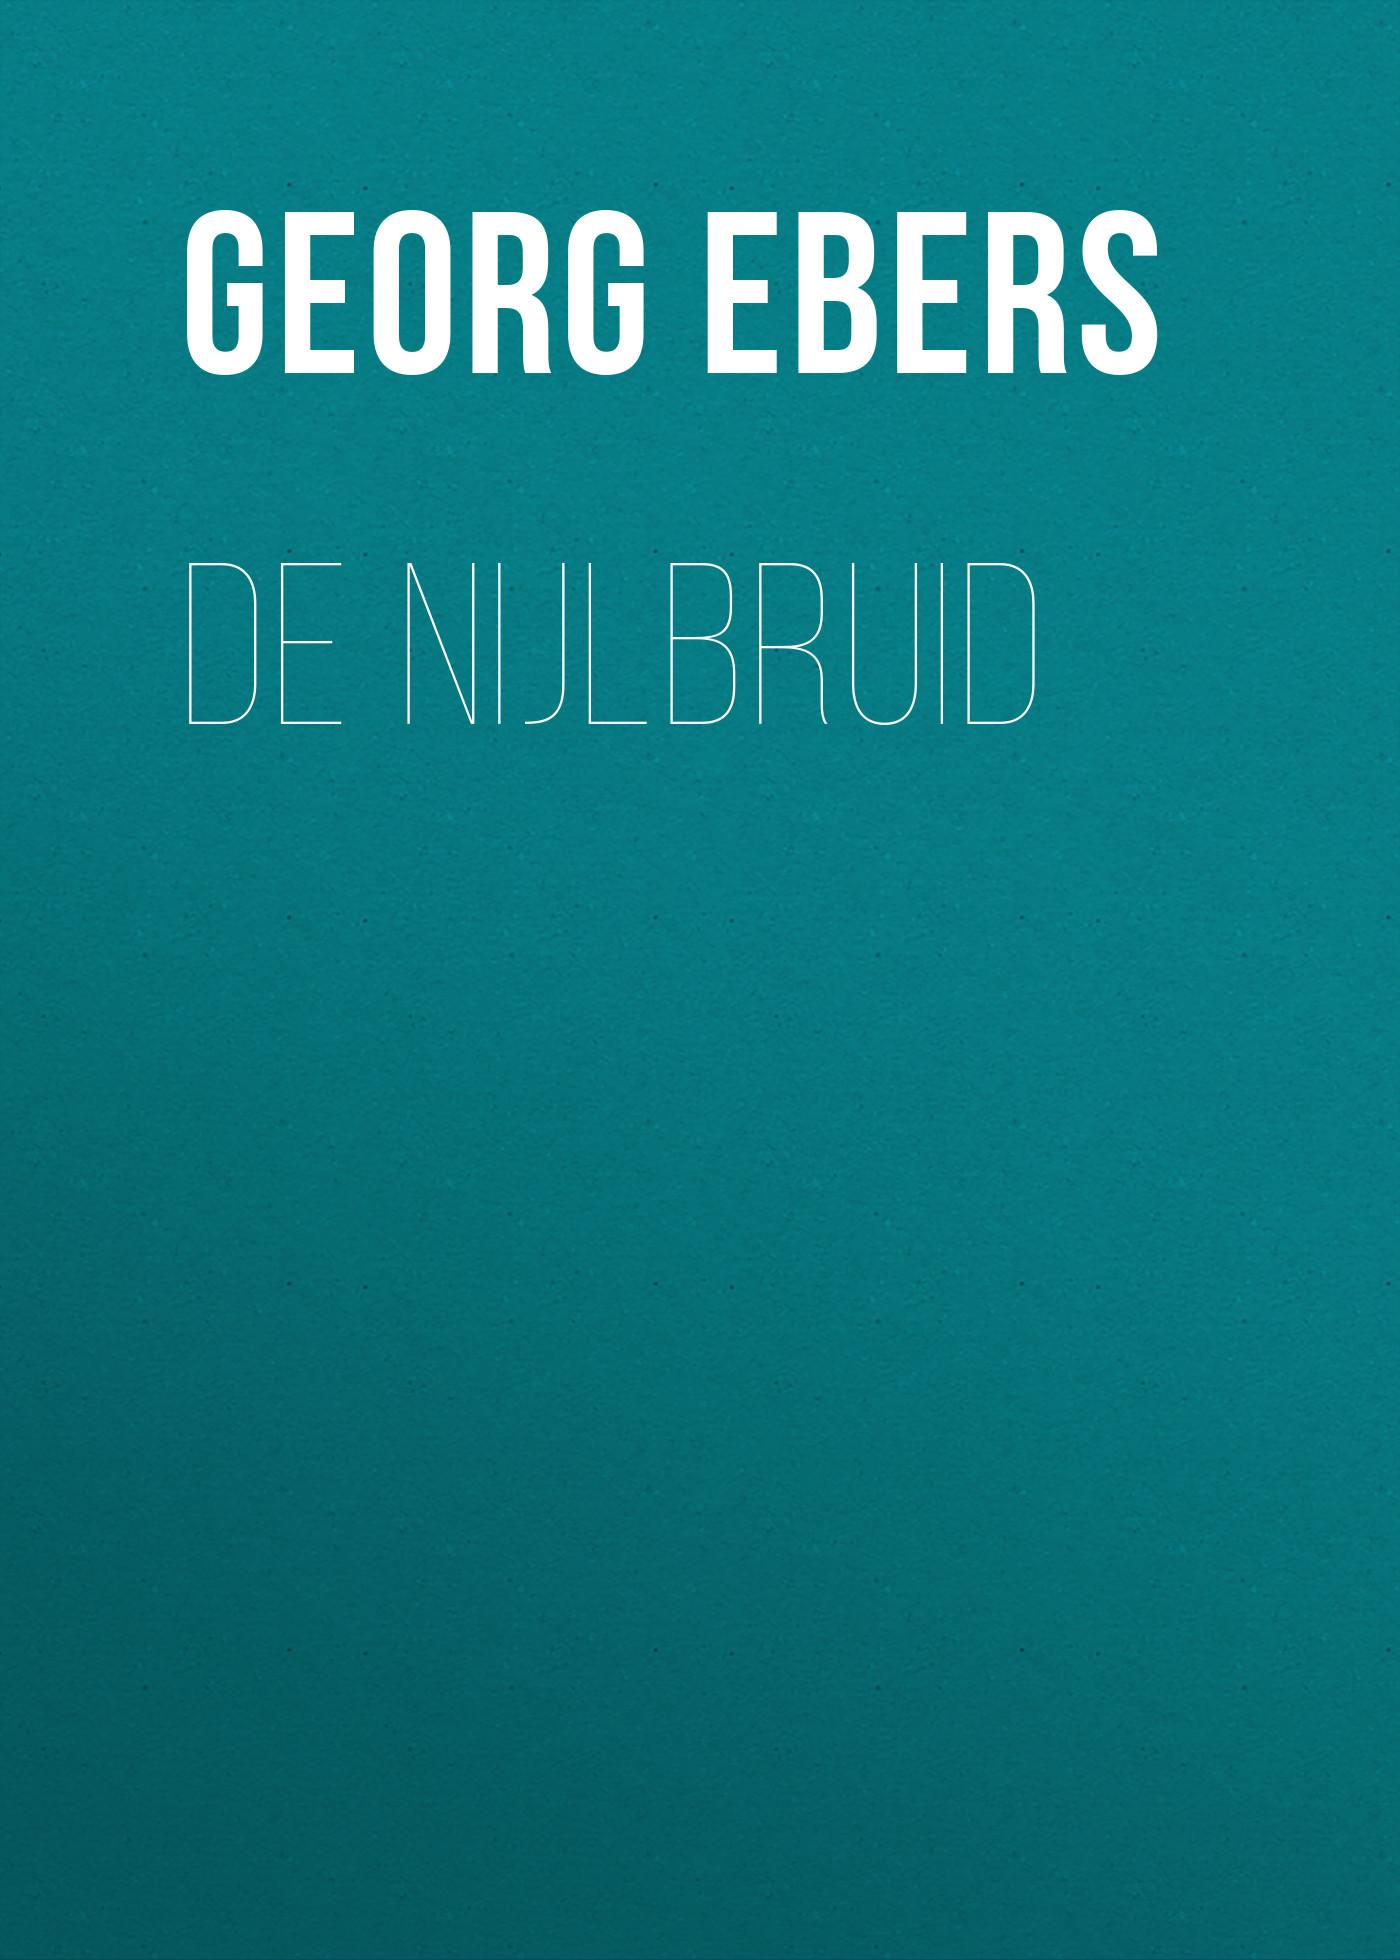 Georg Ebers De nijlbruid georg ebers de nijlbruid